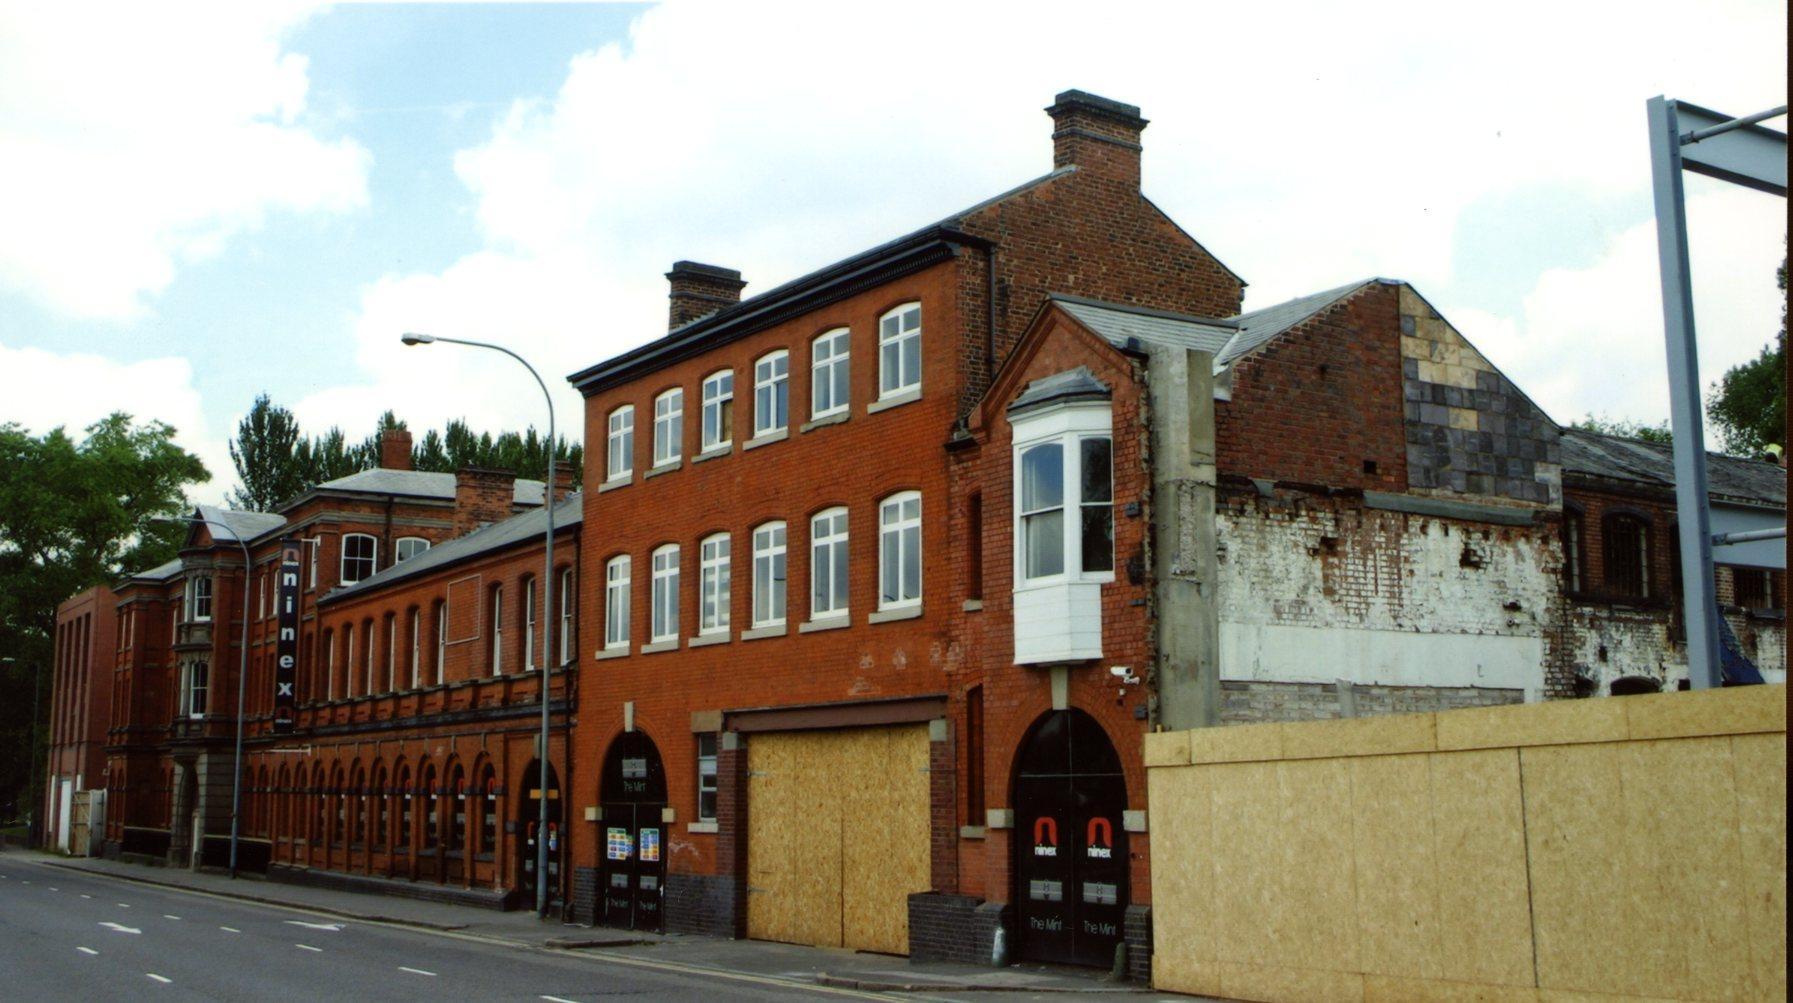 The old Birmingham Mint Building Icknield Street under redevelopment 2015